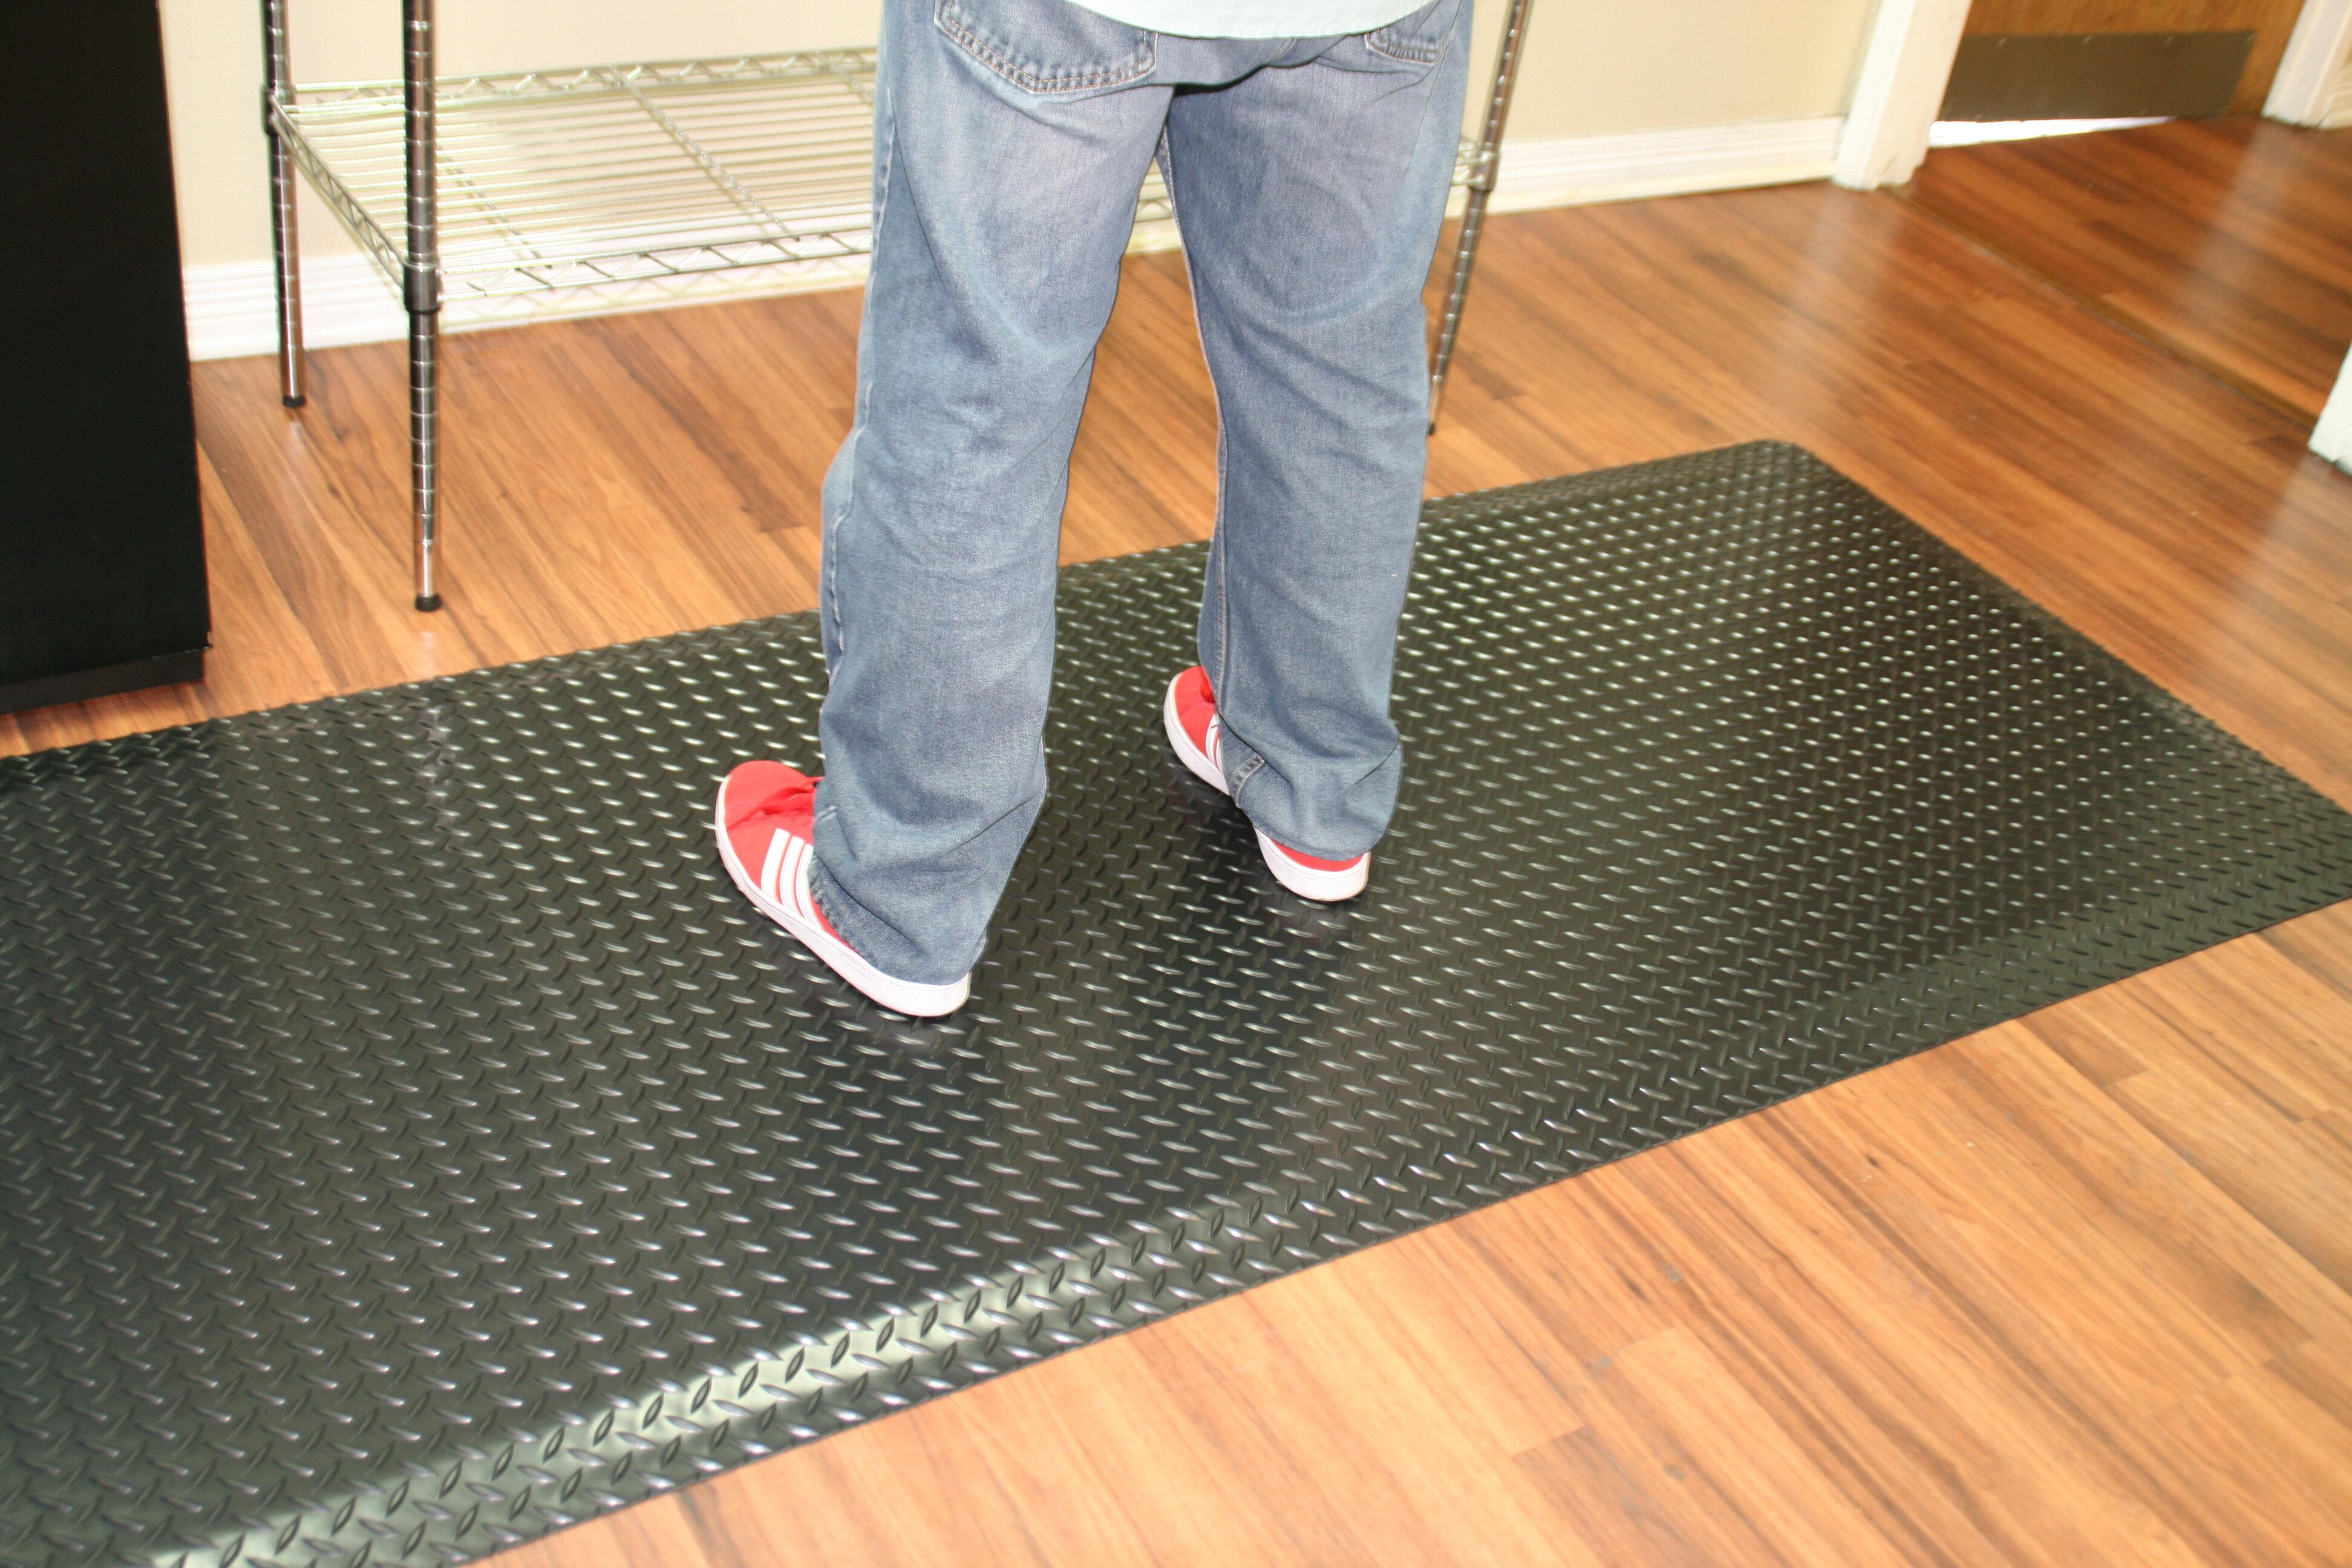 Symple Stuff Diamond Plate Anti Fatigue Garage Flooring Roll In